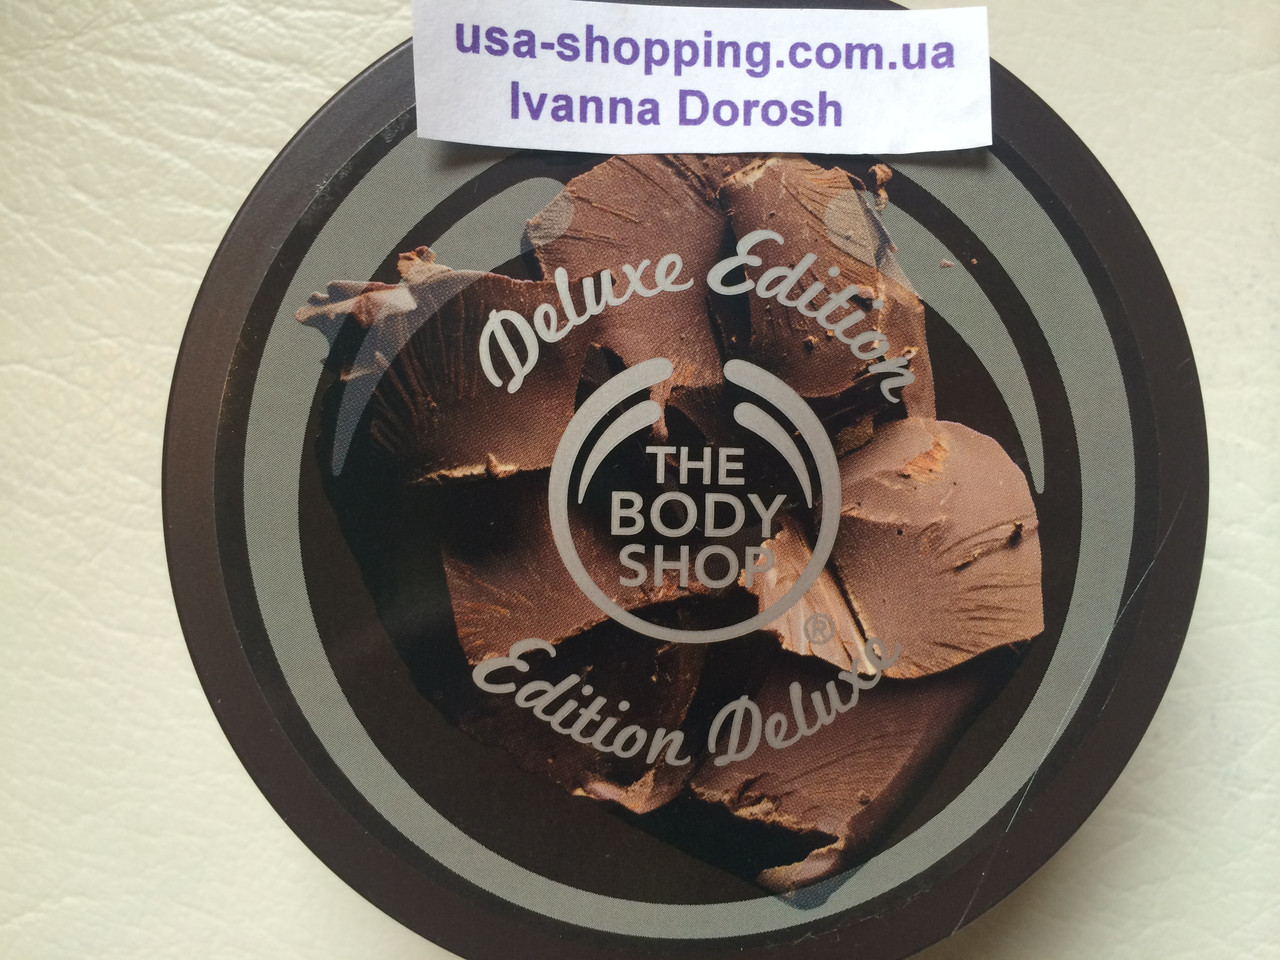 Баттер для тела The Body shop CHOCOMANIA